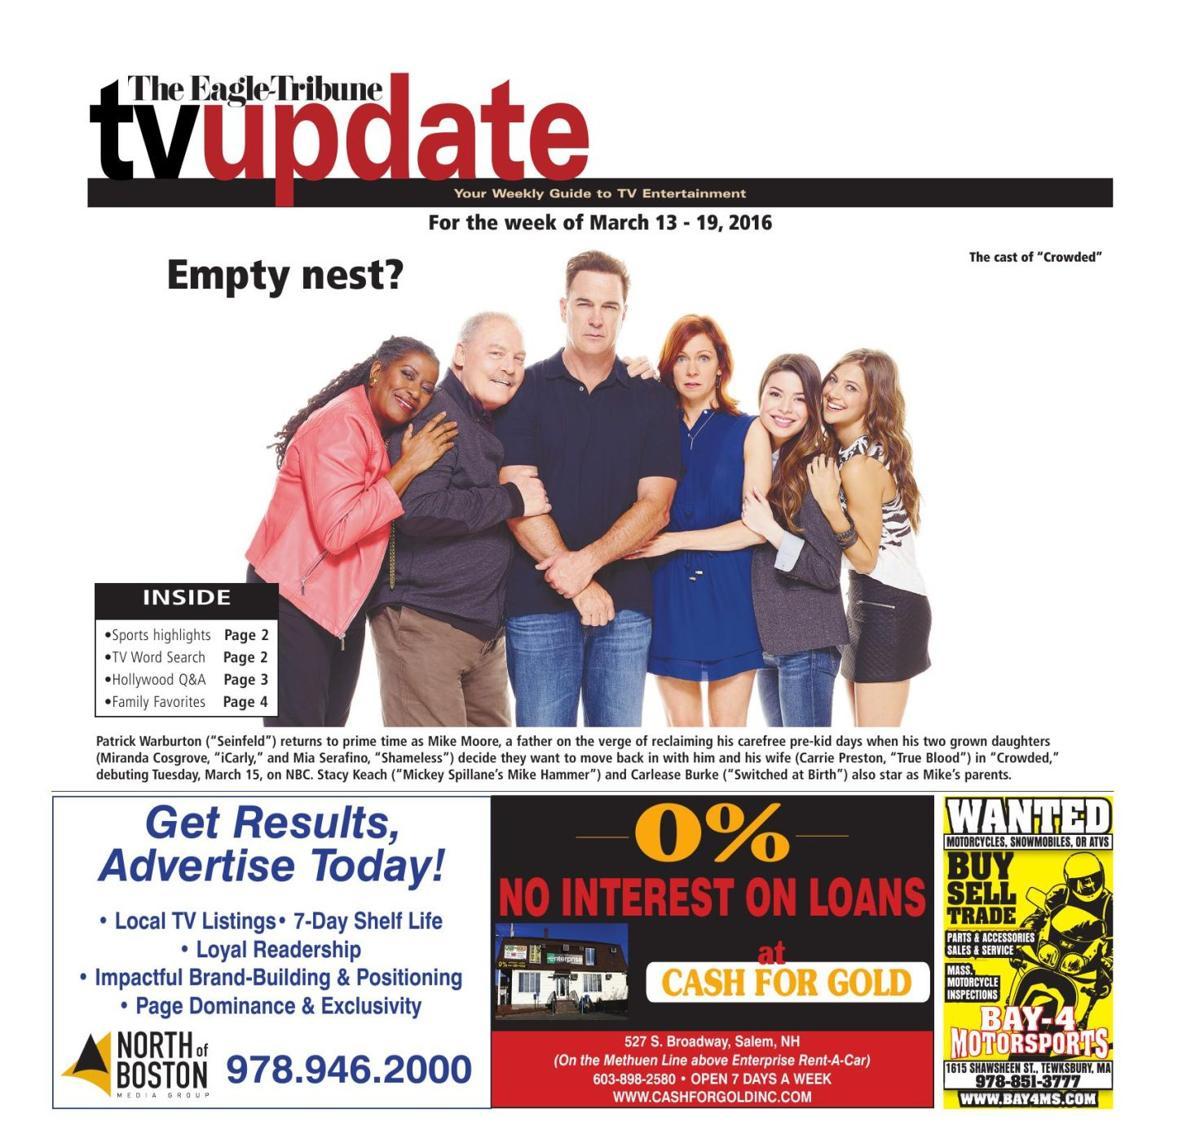 tv update, march 13-19 | tv listings | eagletribune